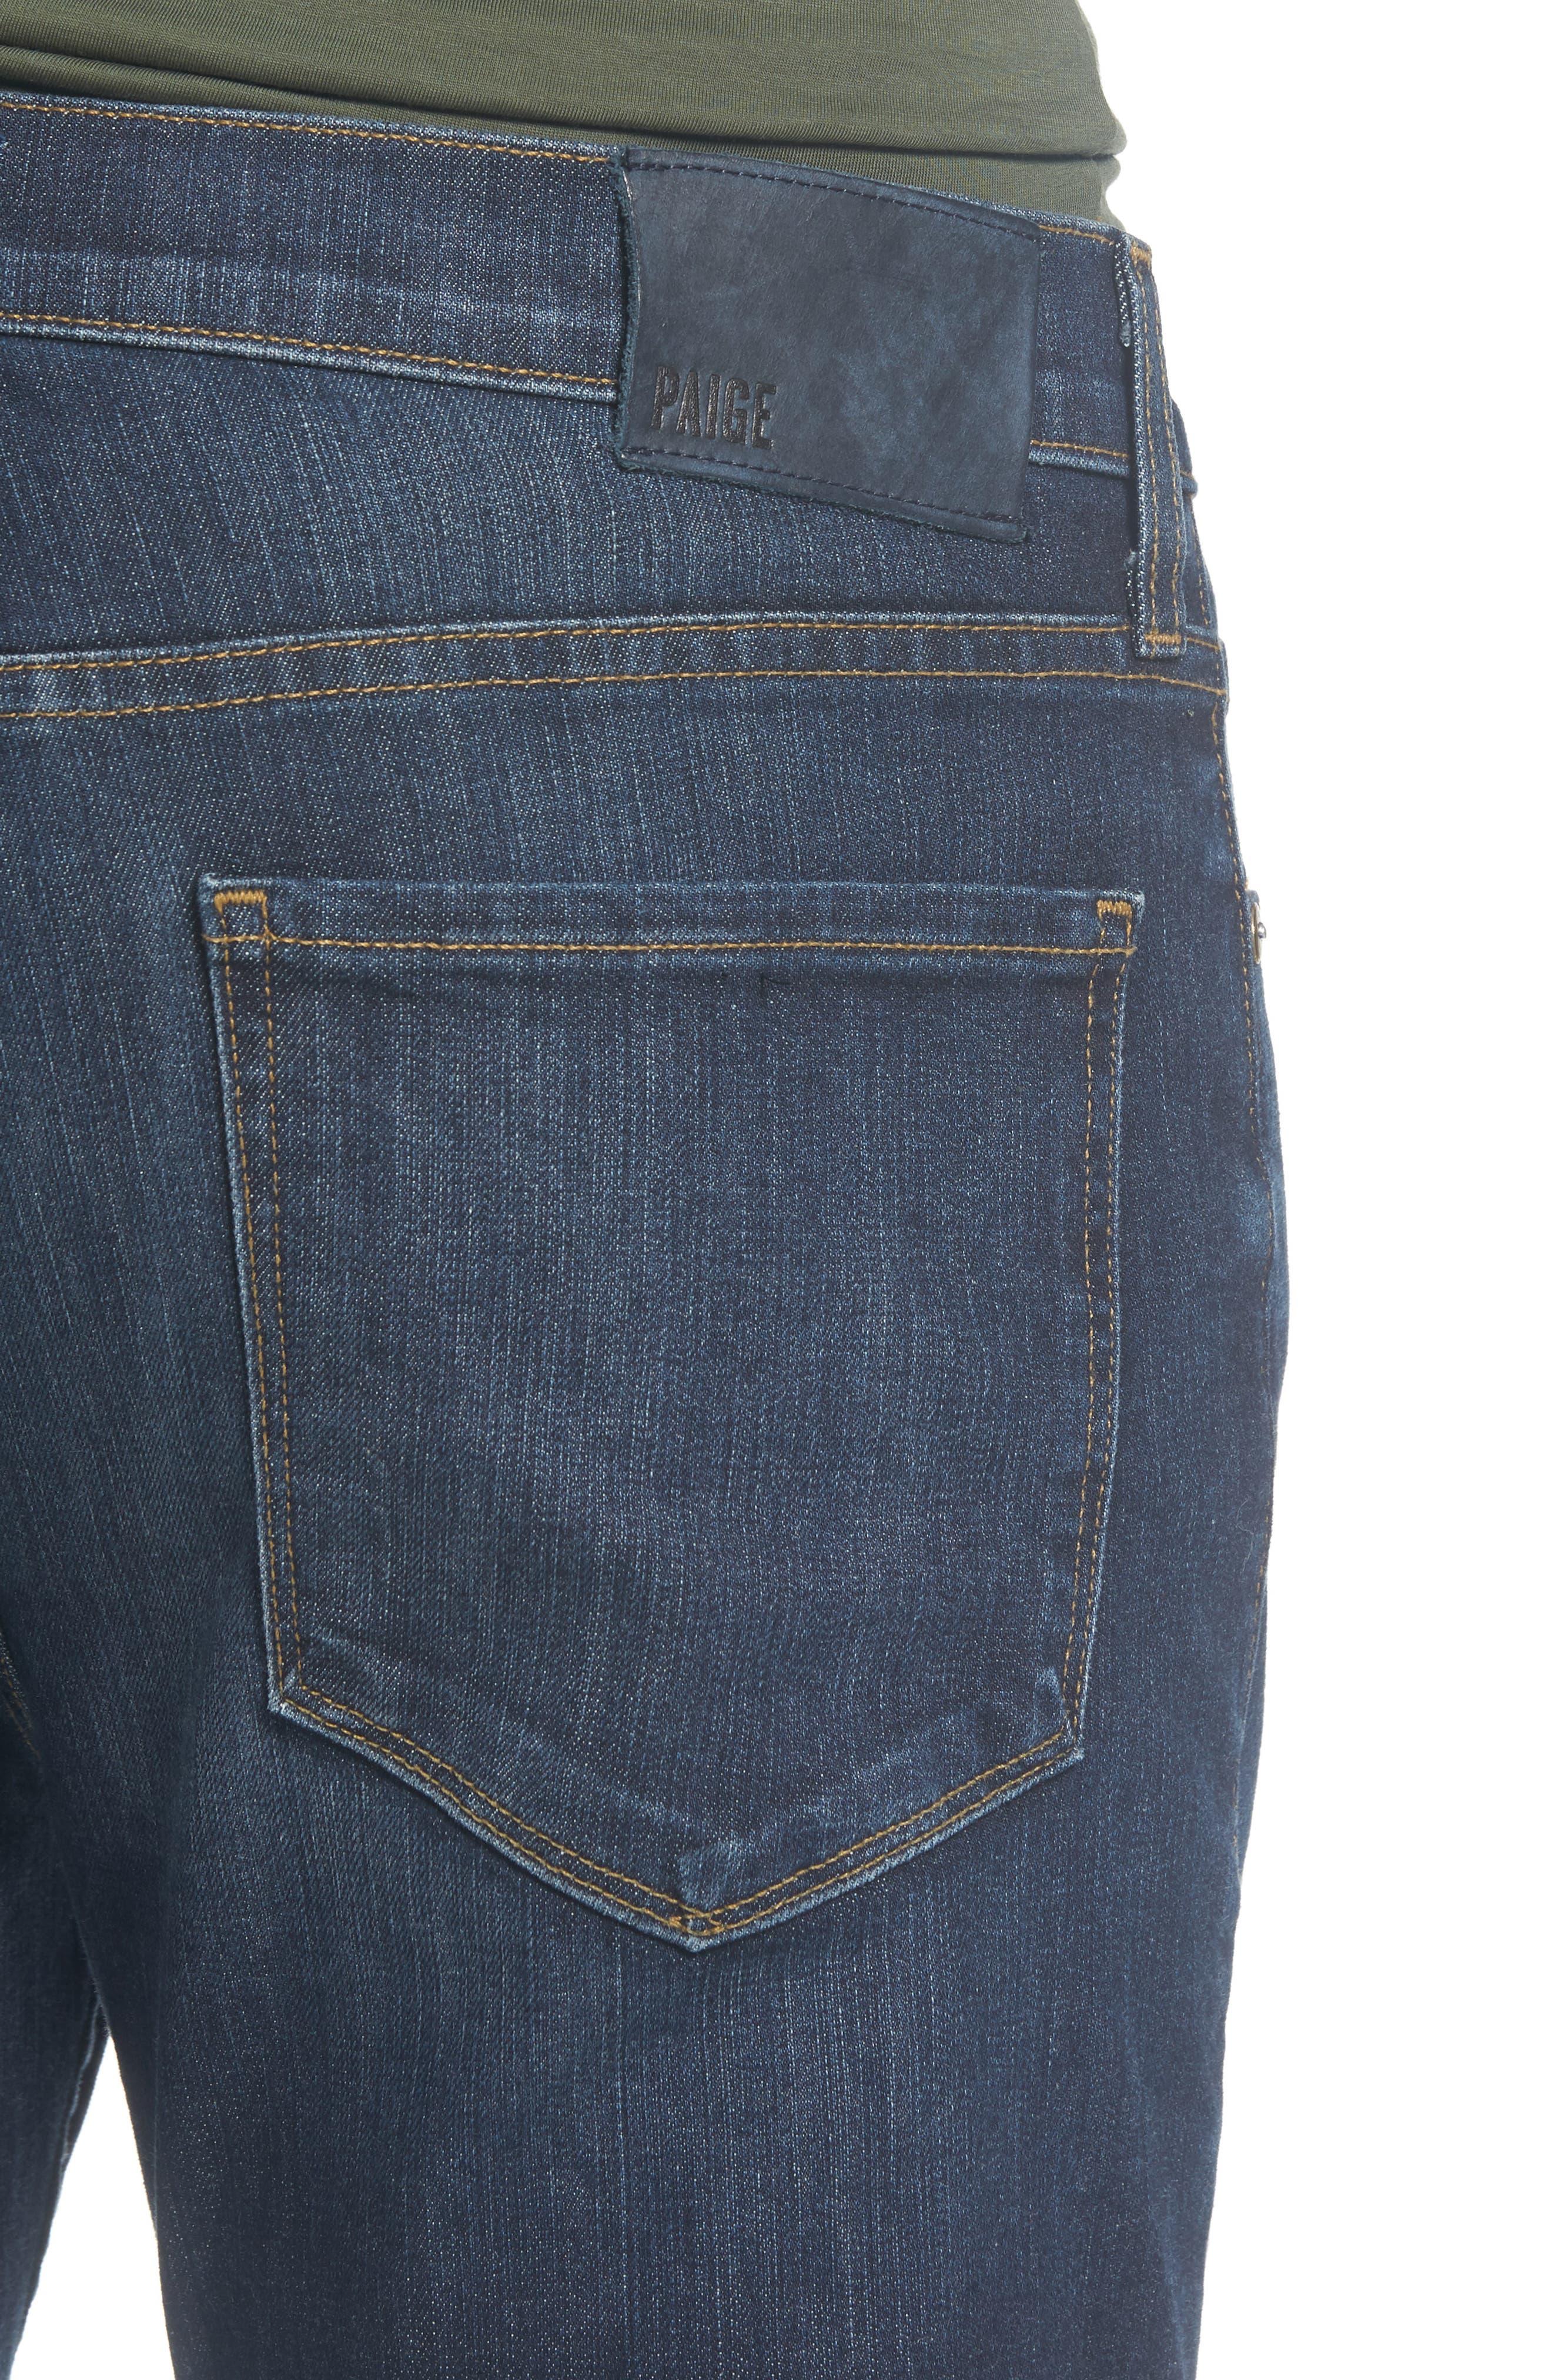 Transcend - Lennox Slim Fit Jeans,                             Alternate thumbnail 4, color,                             Hestan